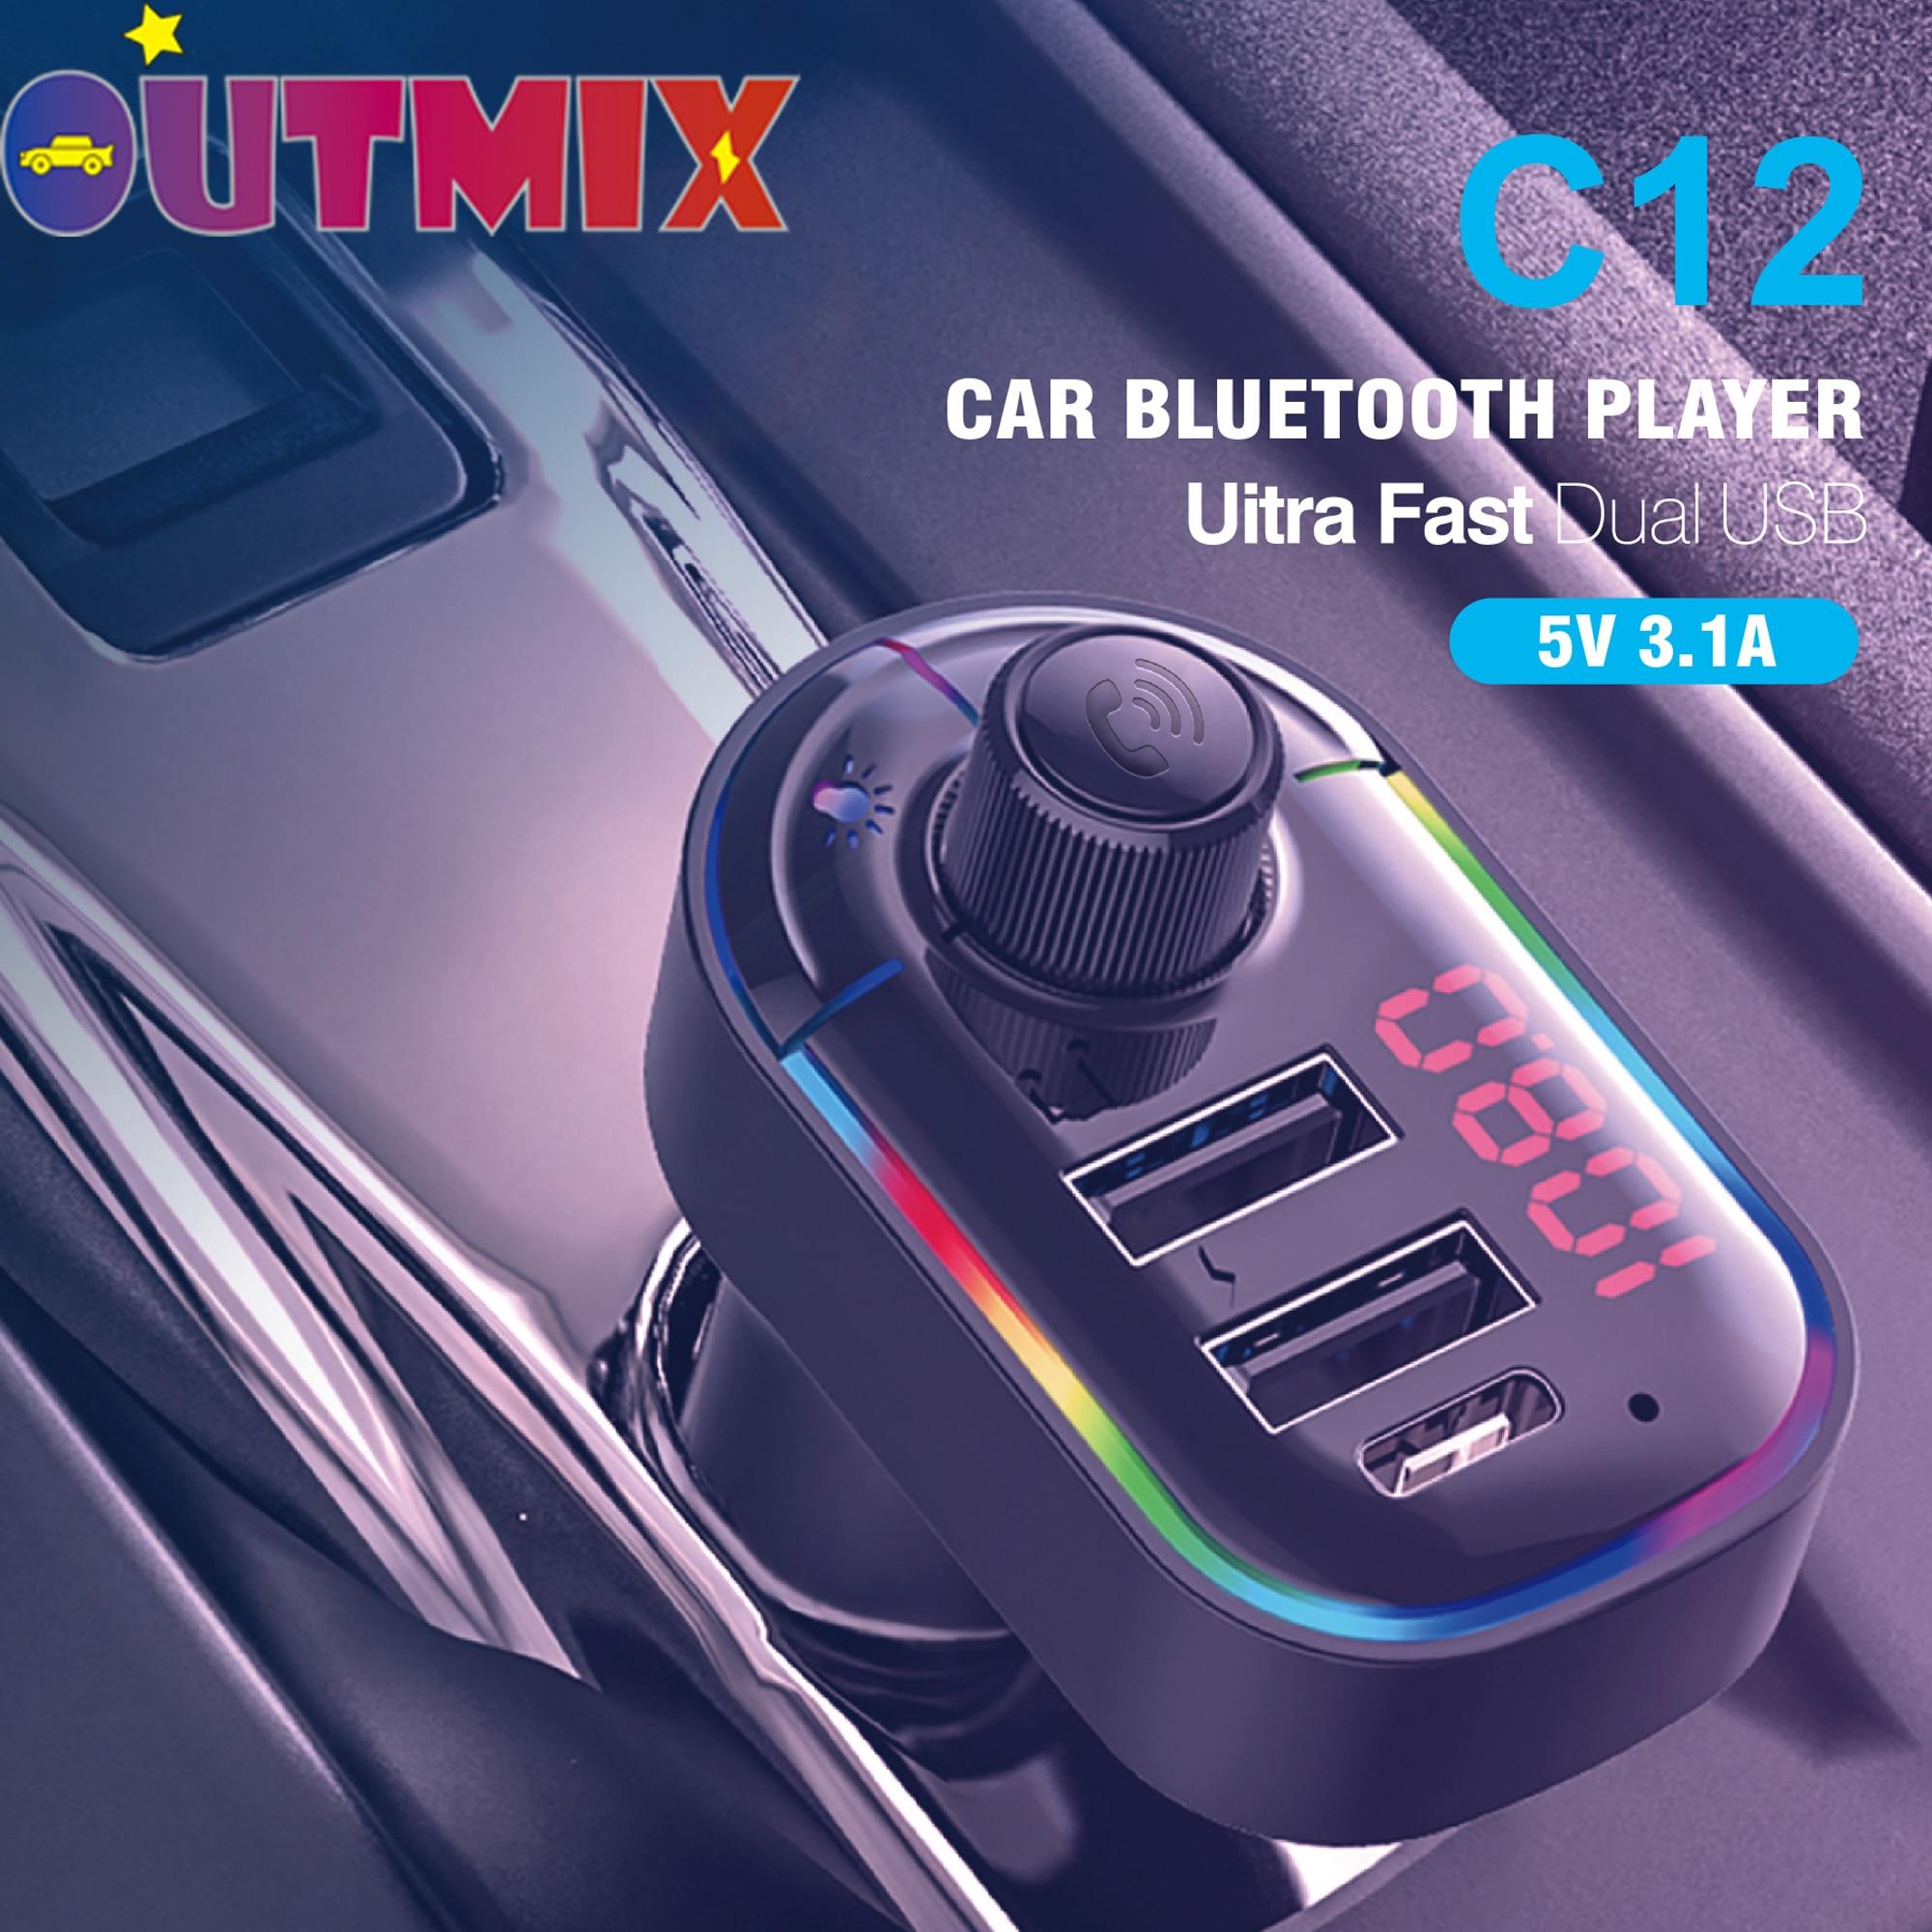 Transmisor de FM Hilfs modulador Bluetooth manos libres Kit de coche de Audio de coche MP3 jugador Mit 3,1 EINE Schnelle Lade Und Umgebungs Licht